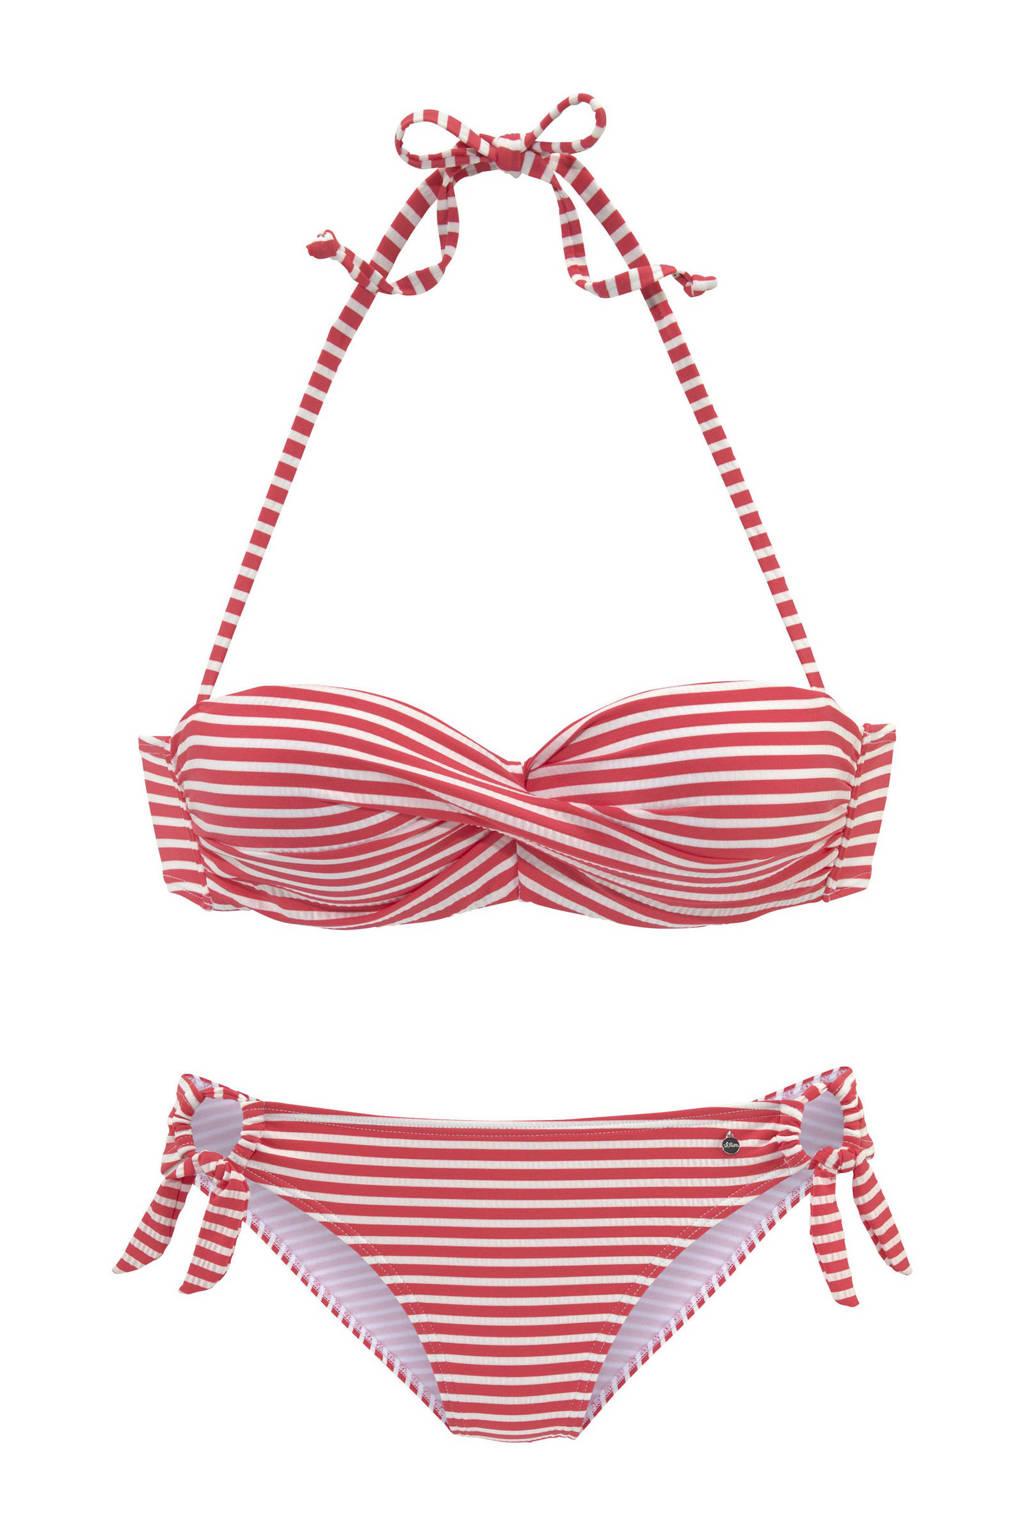 s.Oliver gestreepte strapless bandeau bikini rood/wit, Rood/wit